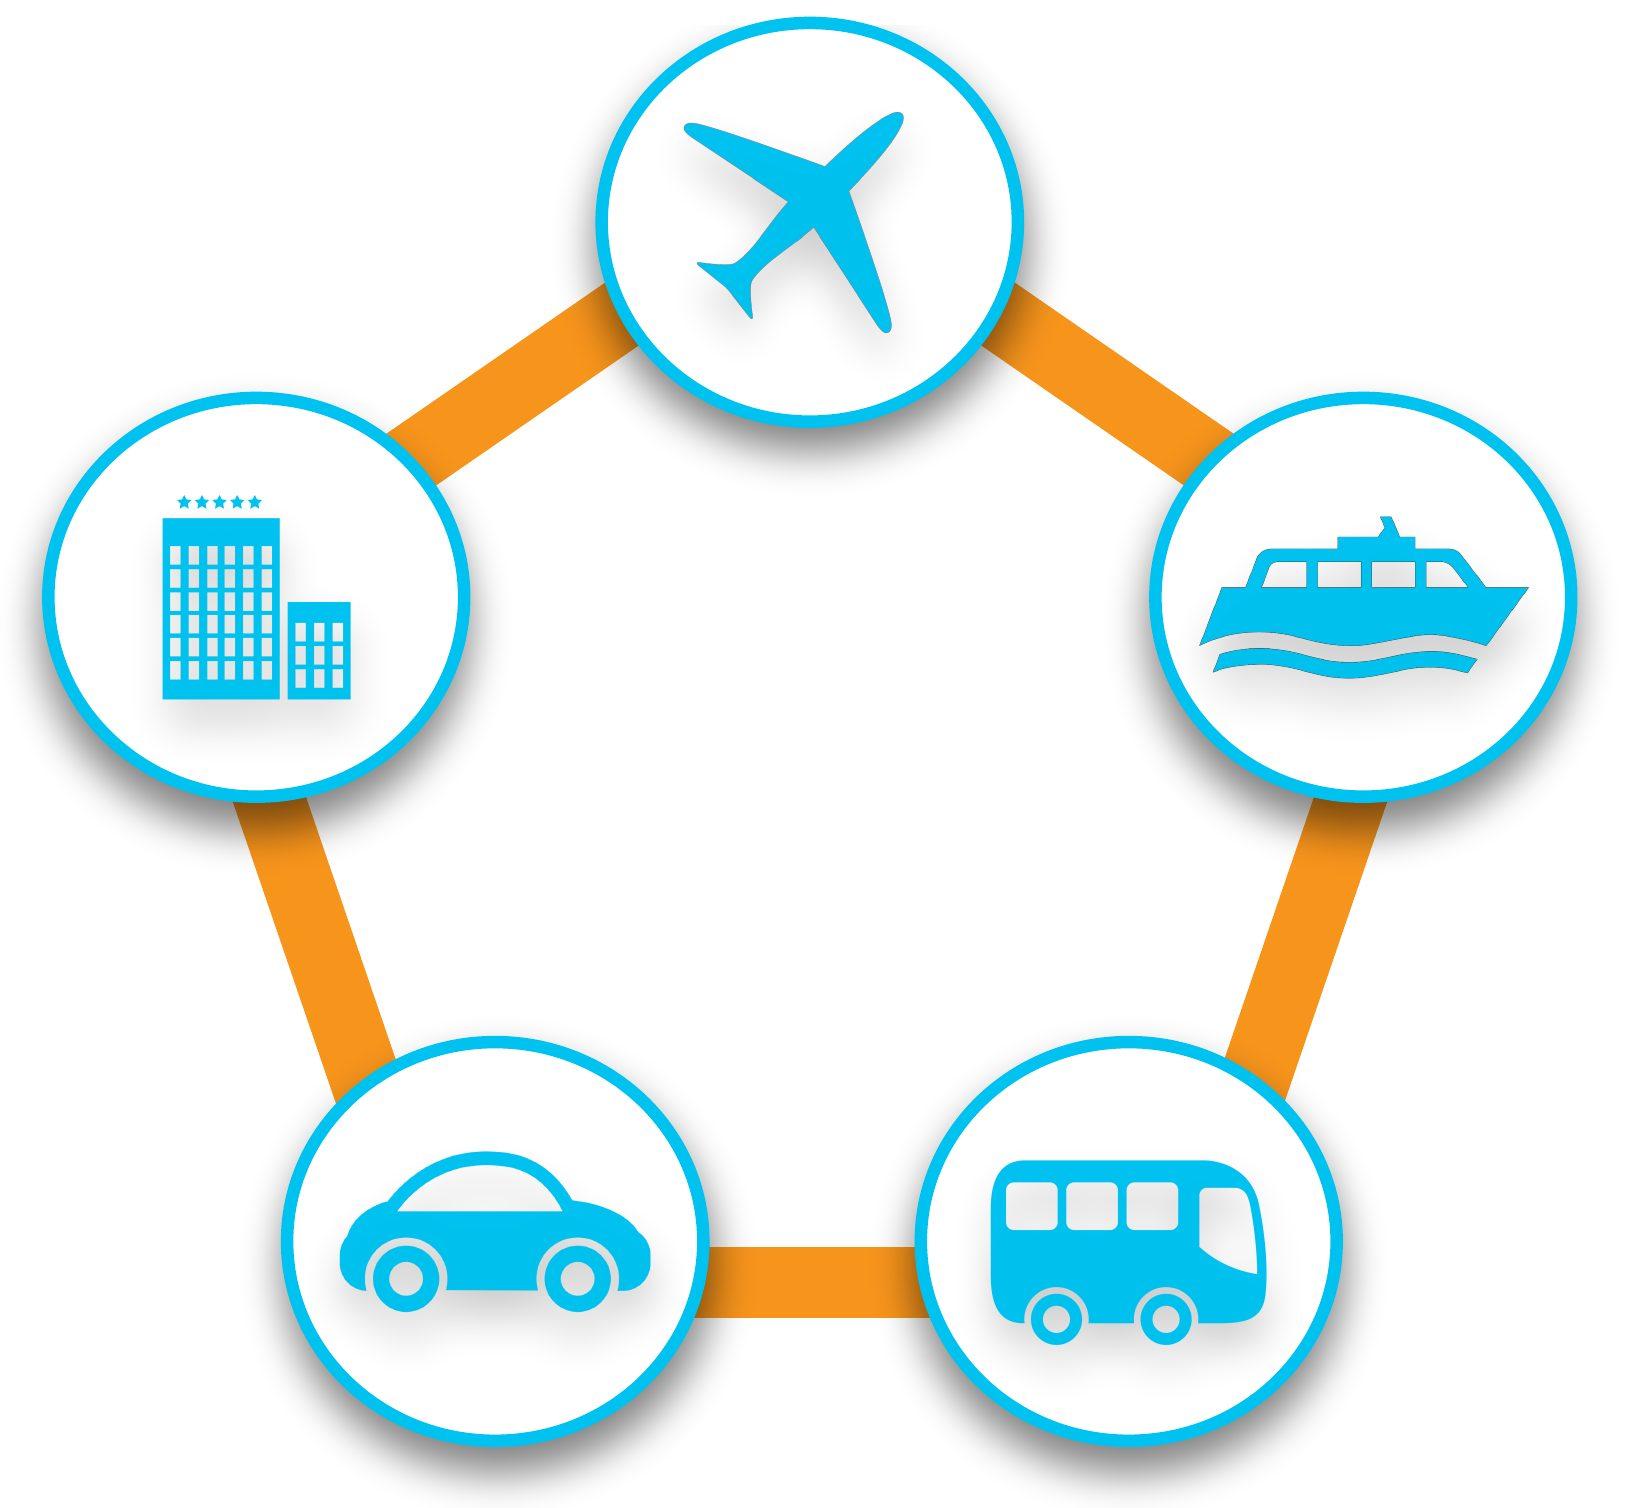 Flights, Hotels, Car, Rental, Business, Tour, Travel, Vacation